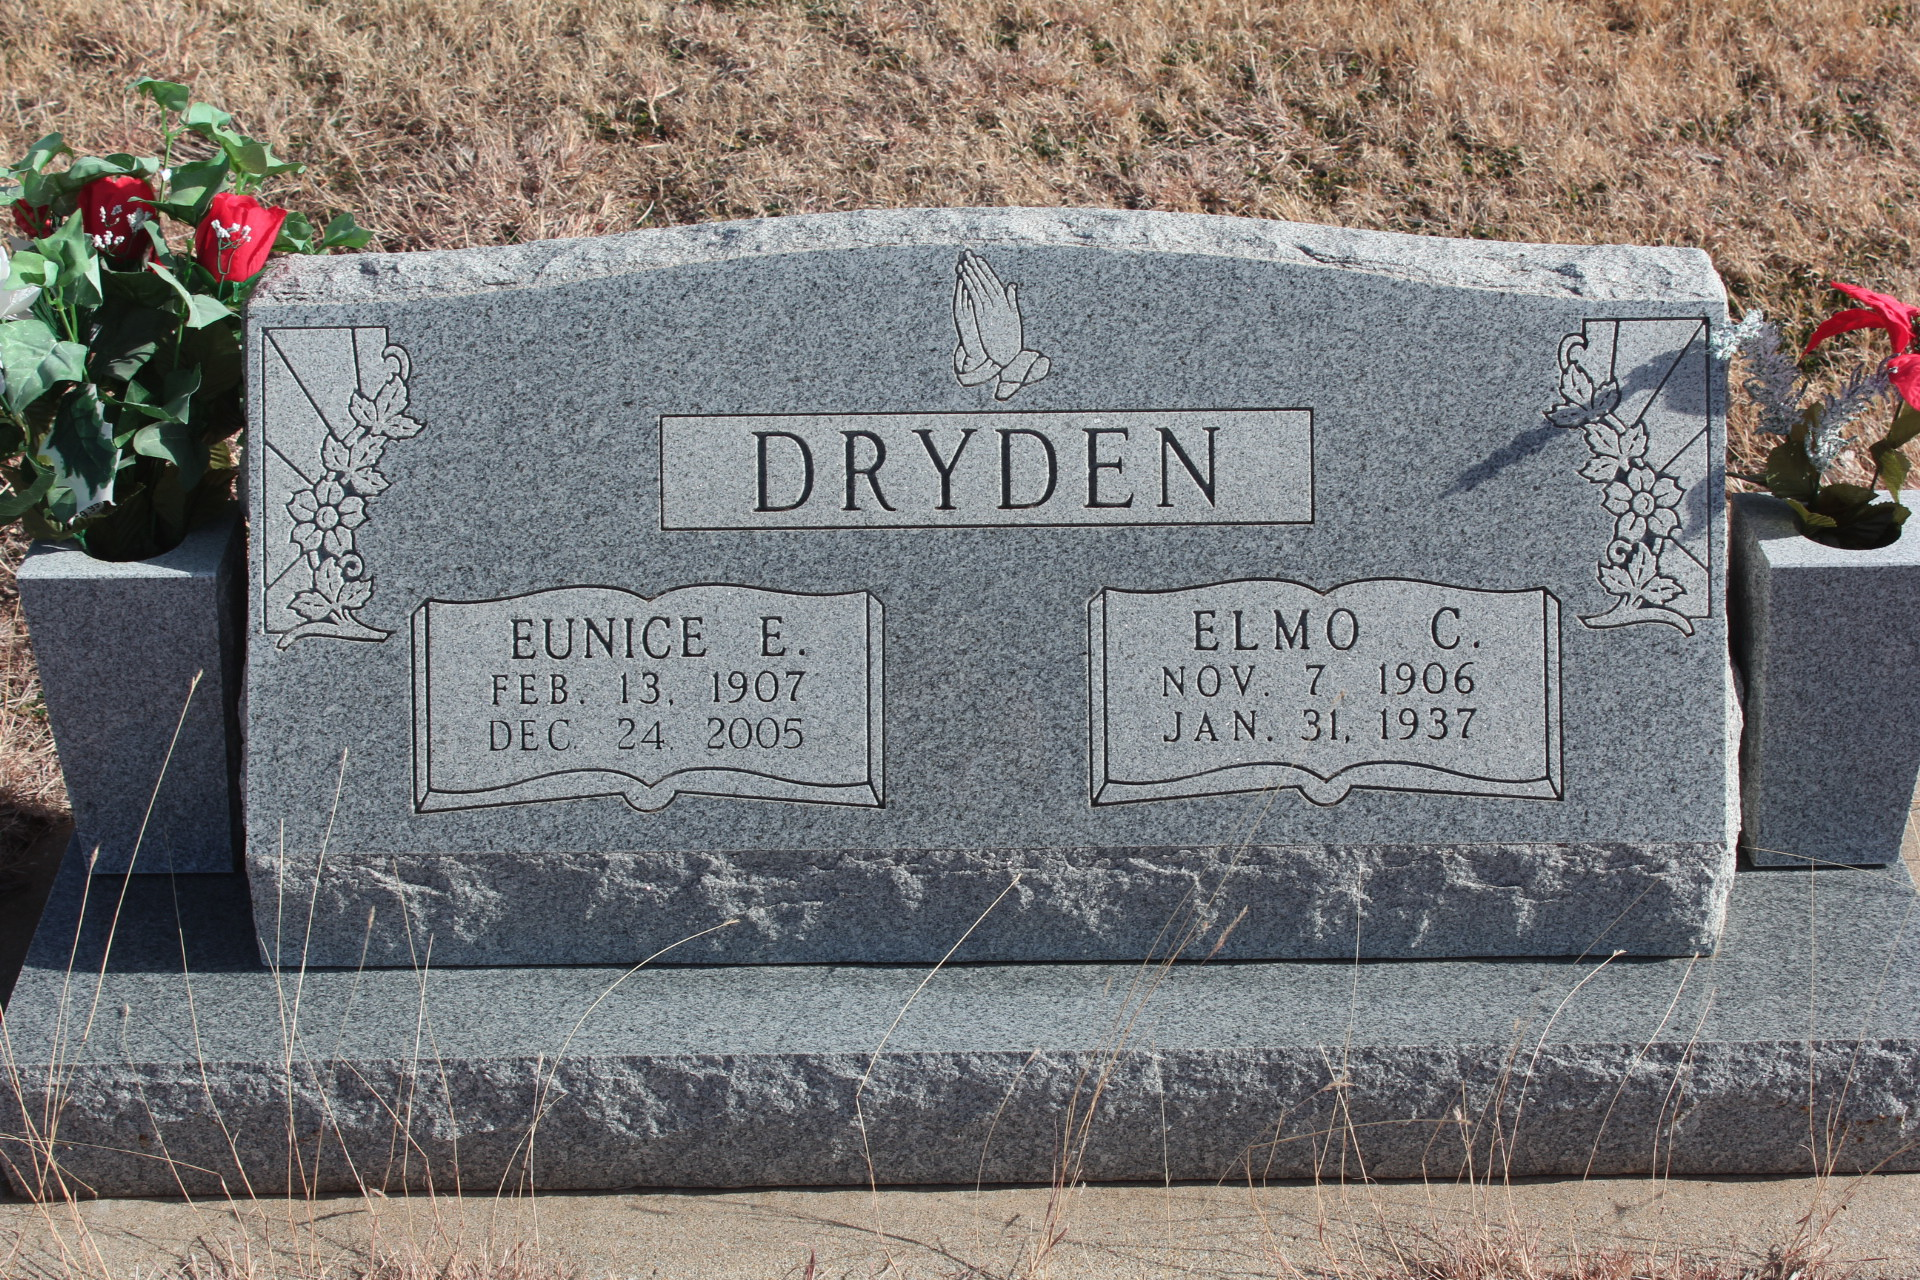 Charles Dryden